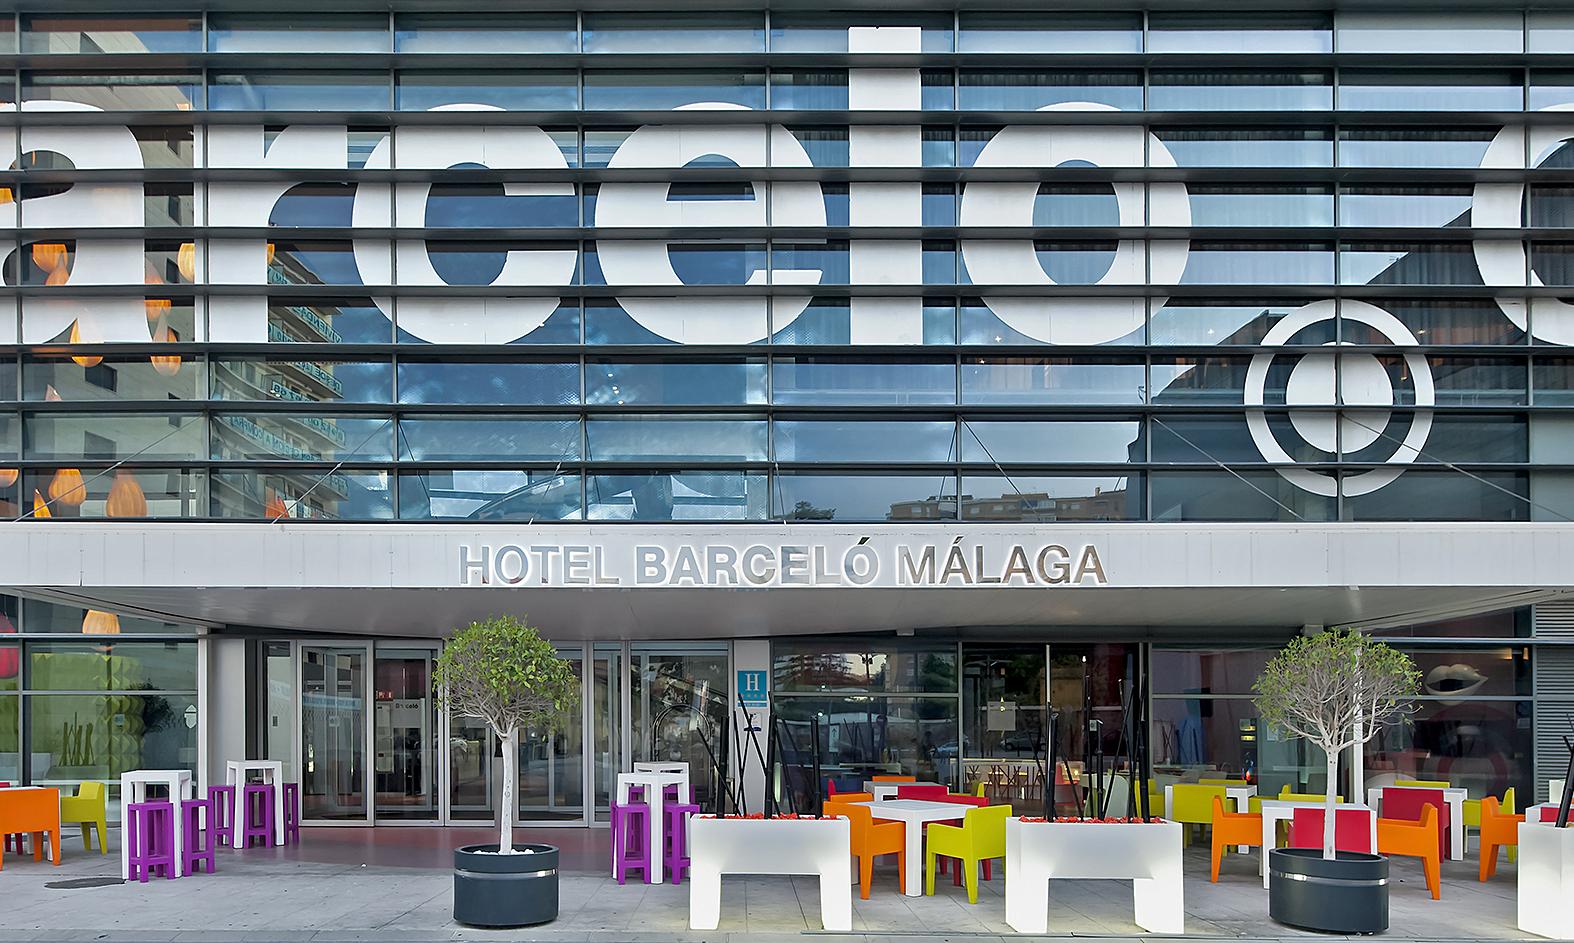 hotel_barcelo_malaga